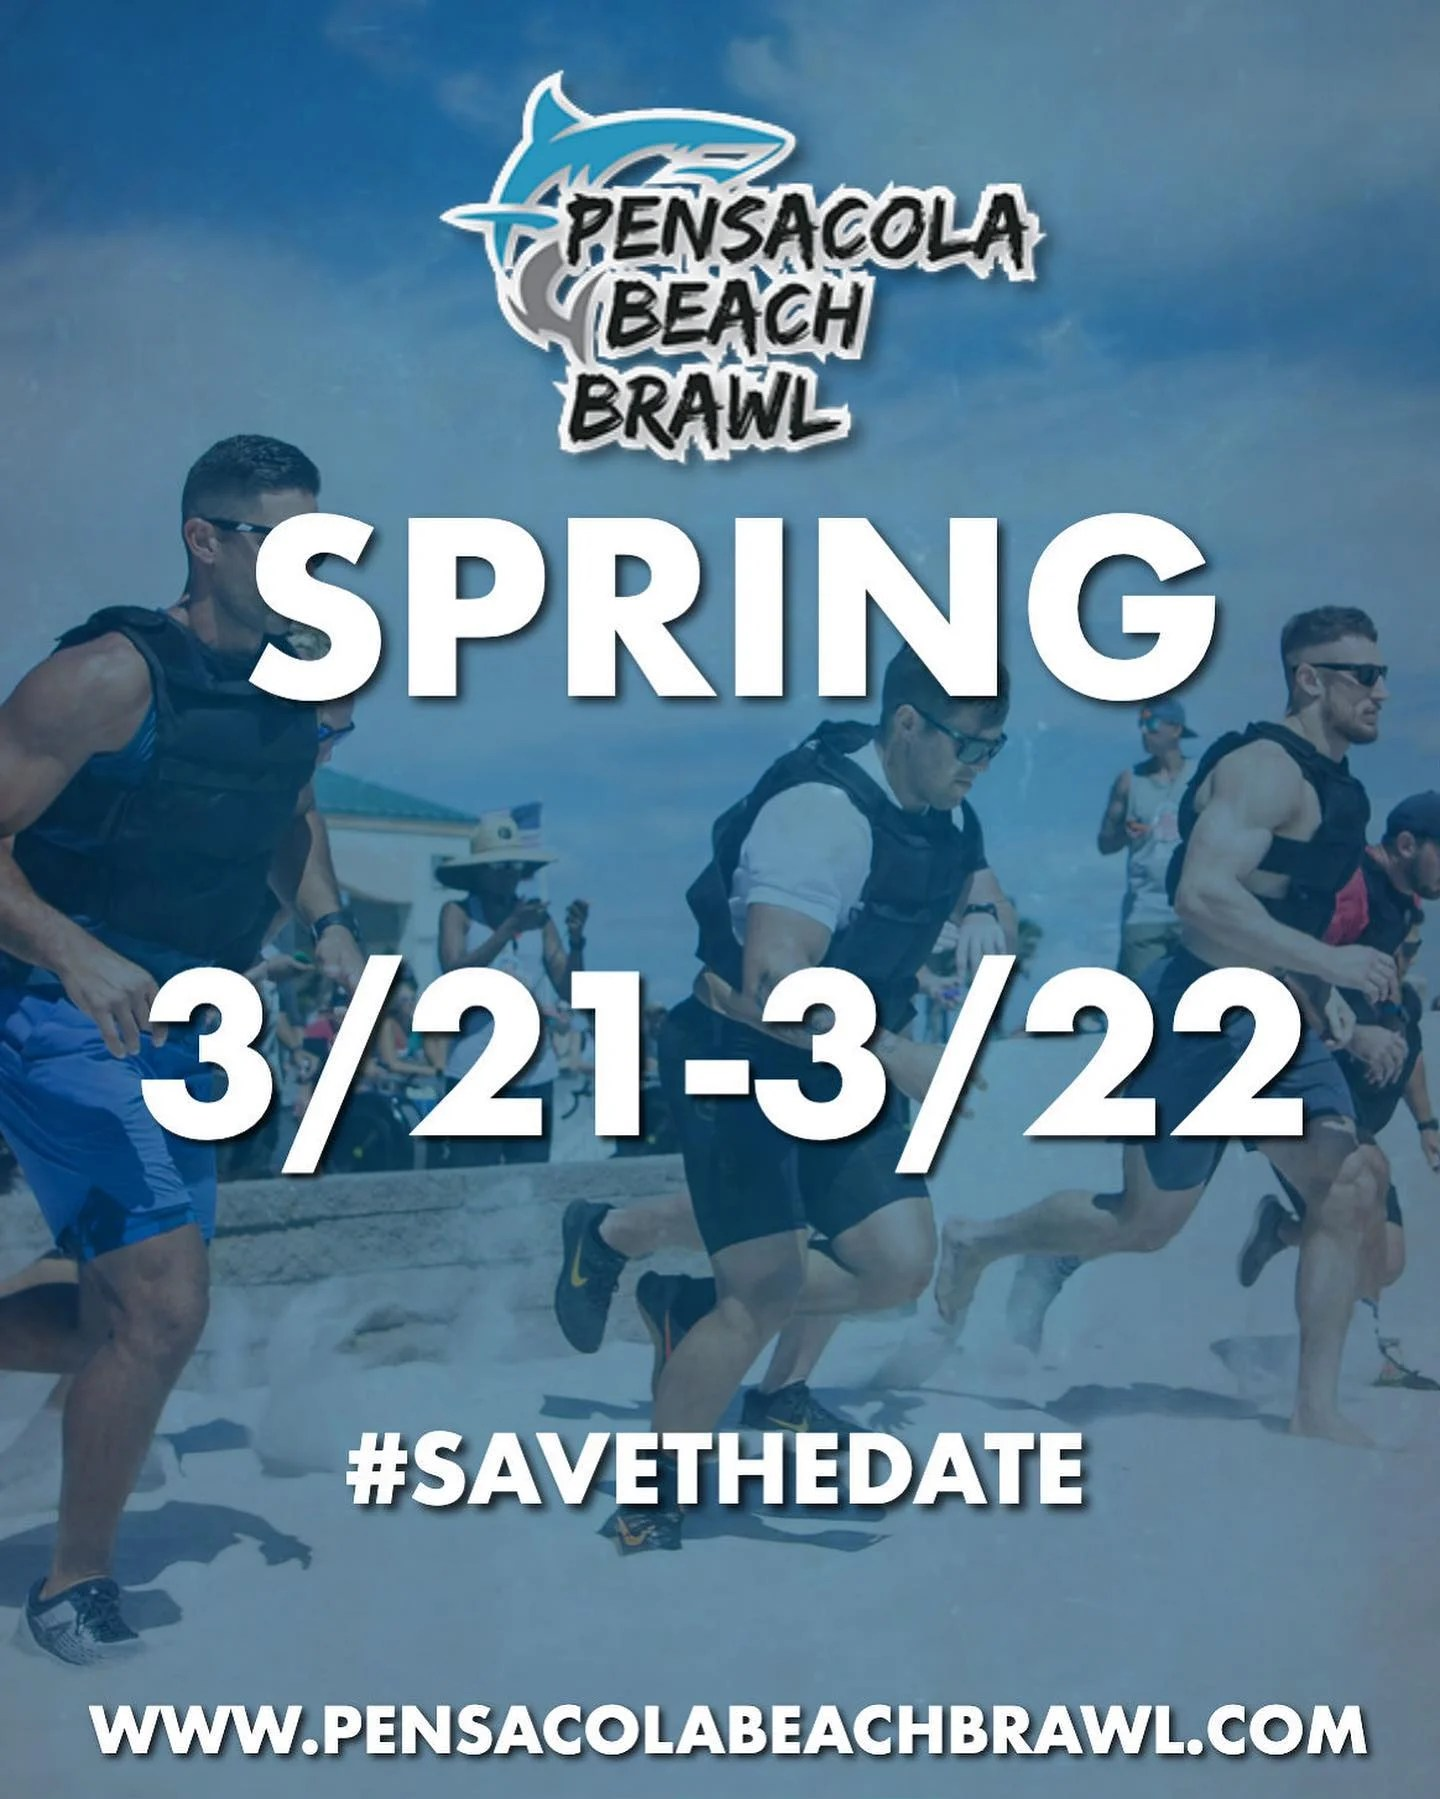 pensacola-beach-brawl-spring